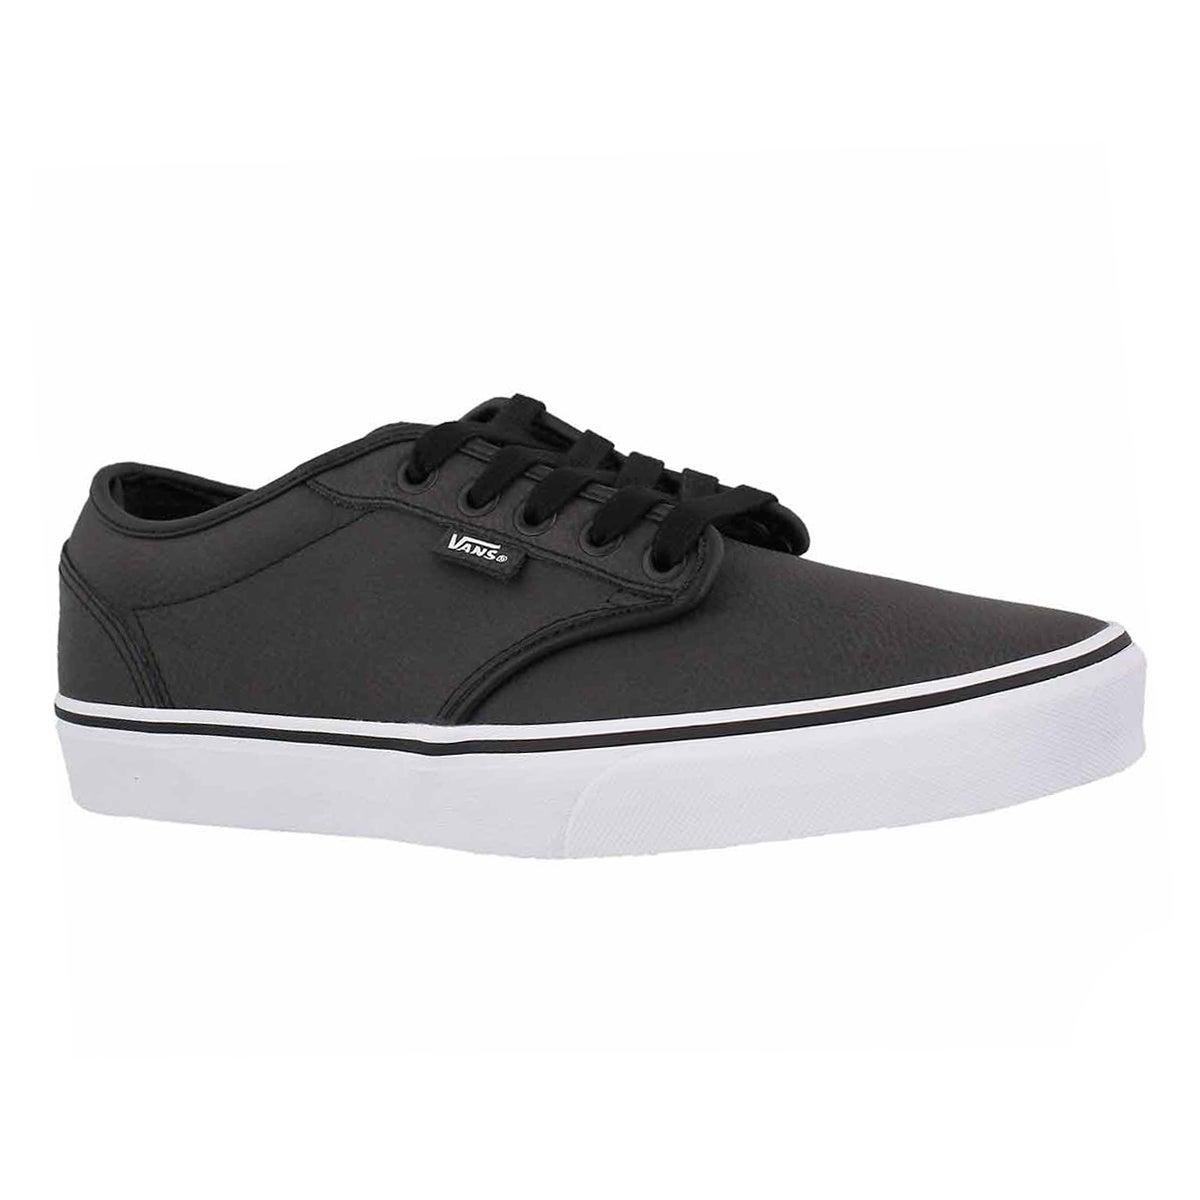 Vans-039-Men-039-s-Atwood-Lace-Up-Sneaker